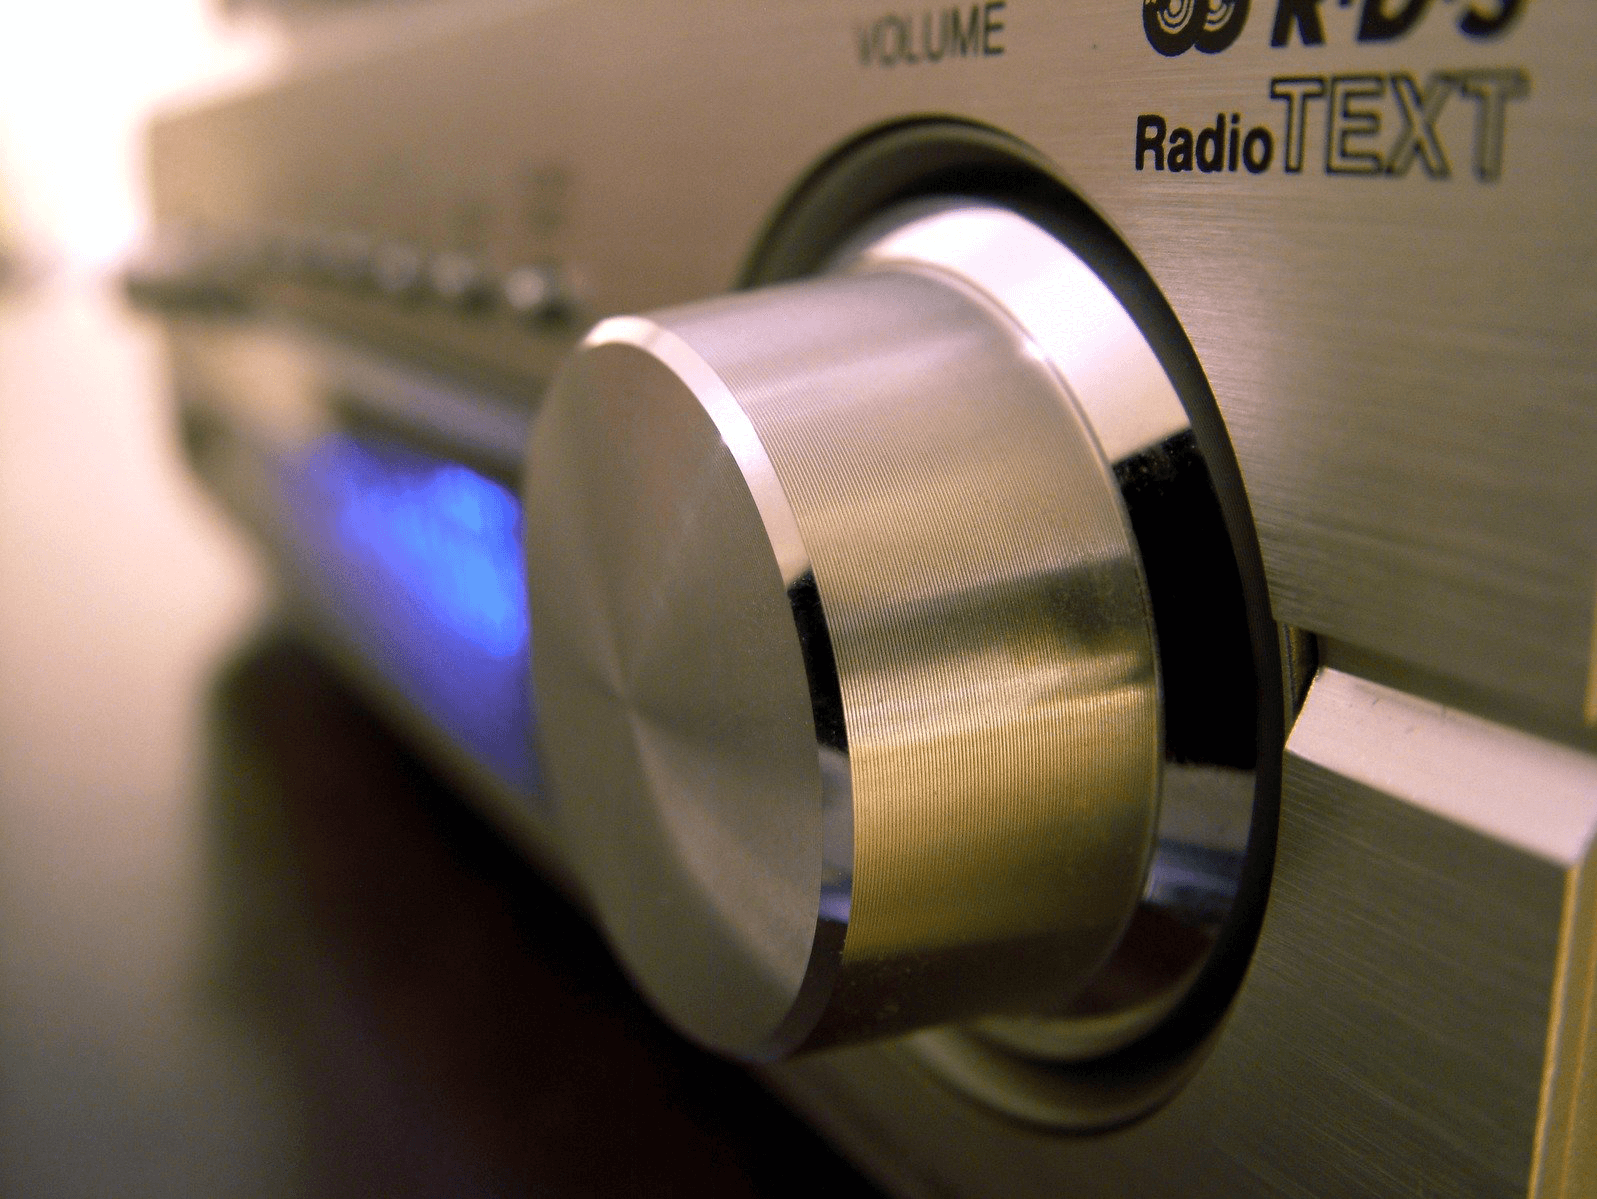 image of a radio